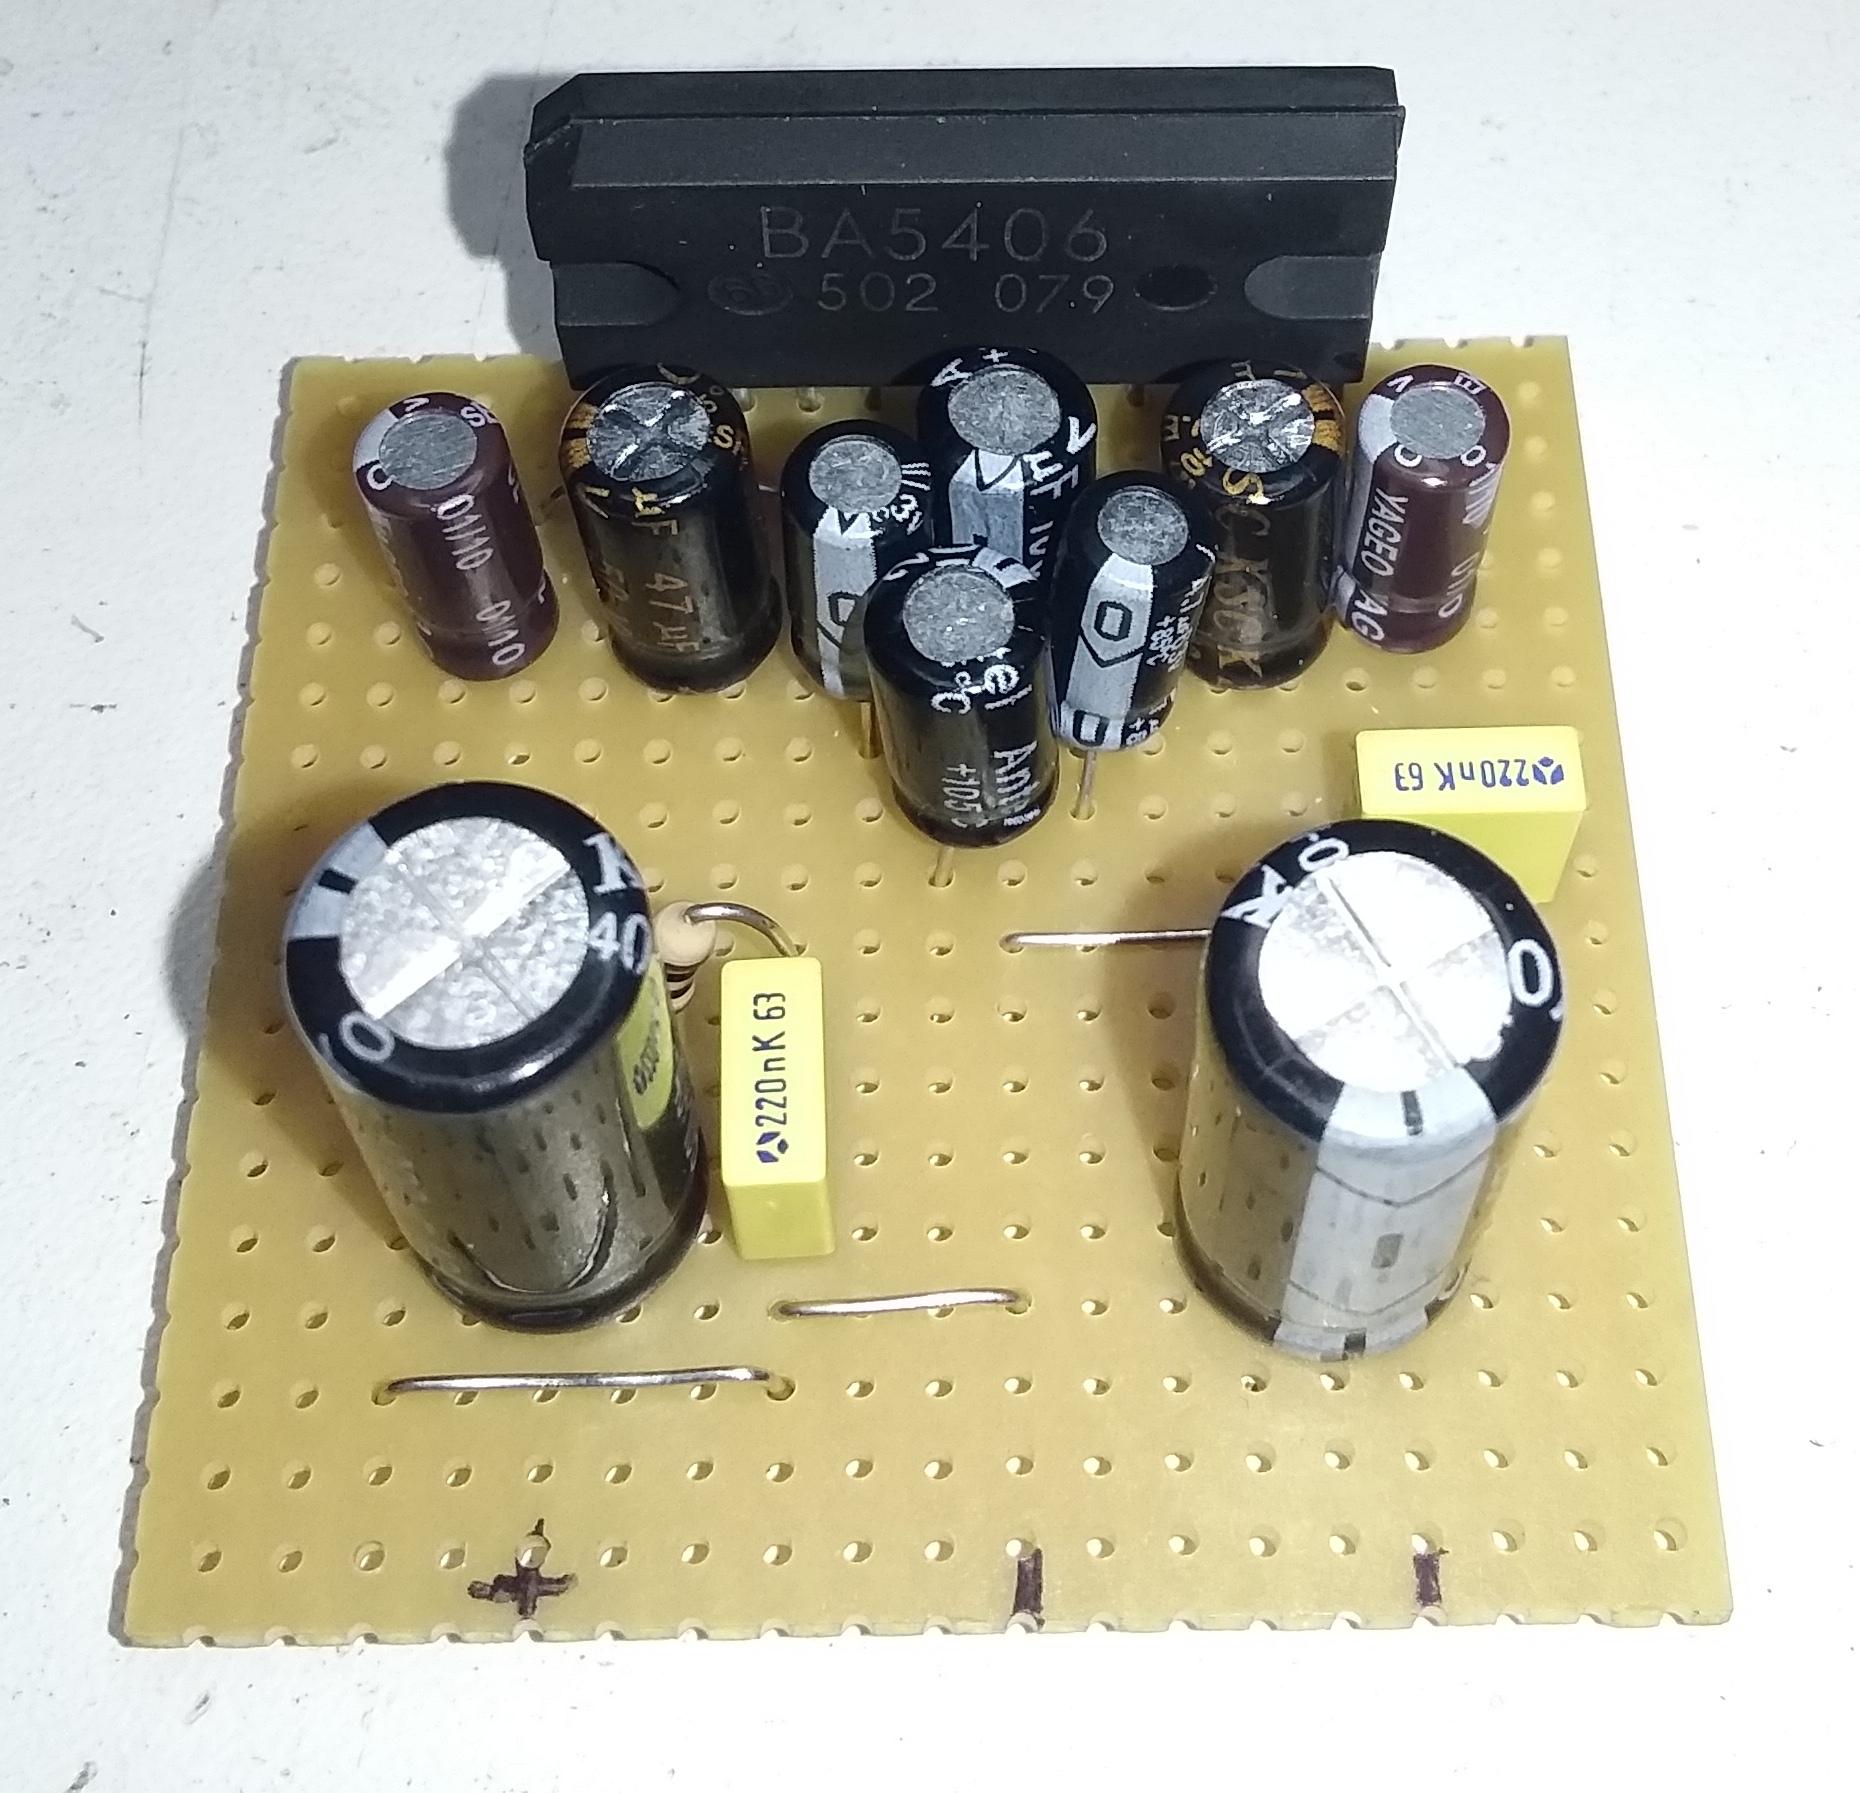 Ampli BA5406-08